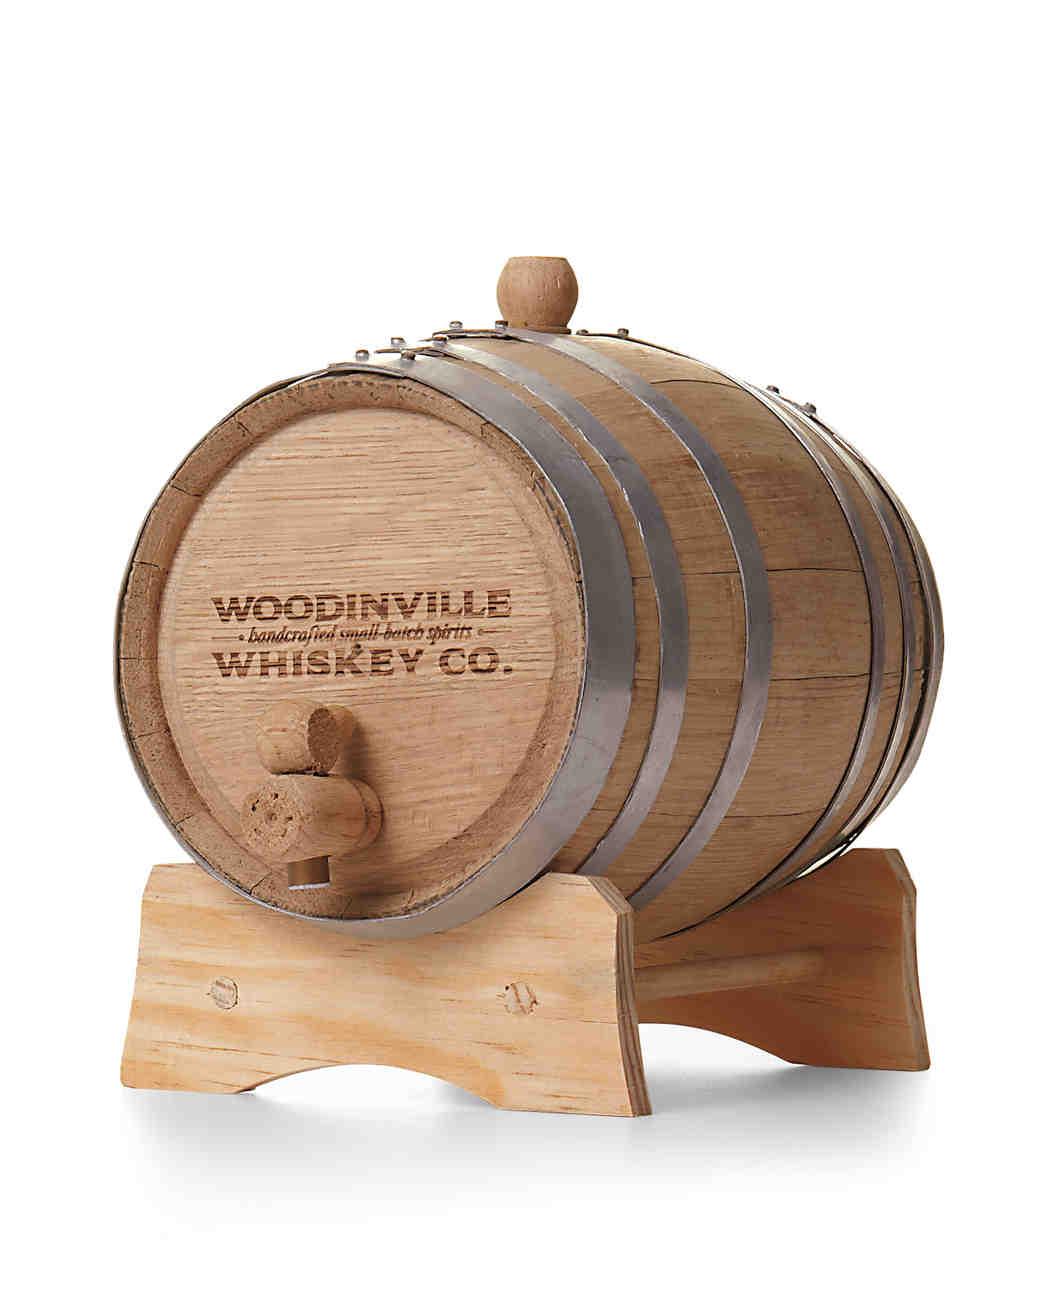 whiskey-kit-003-mwd109728.jpg